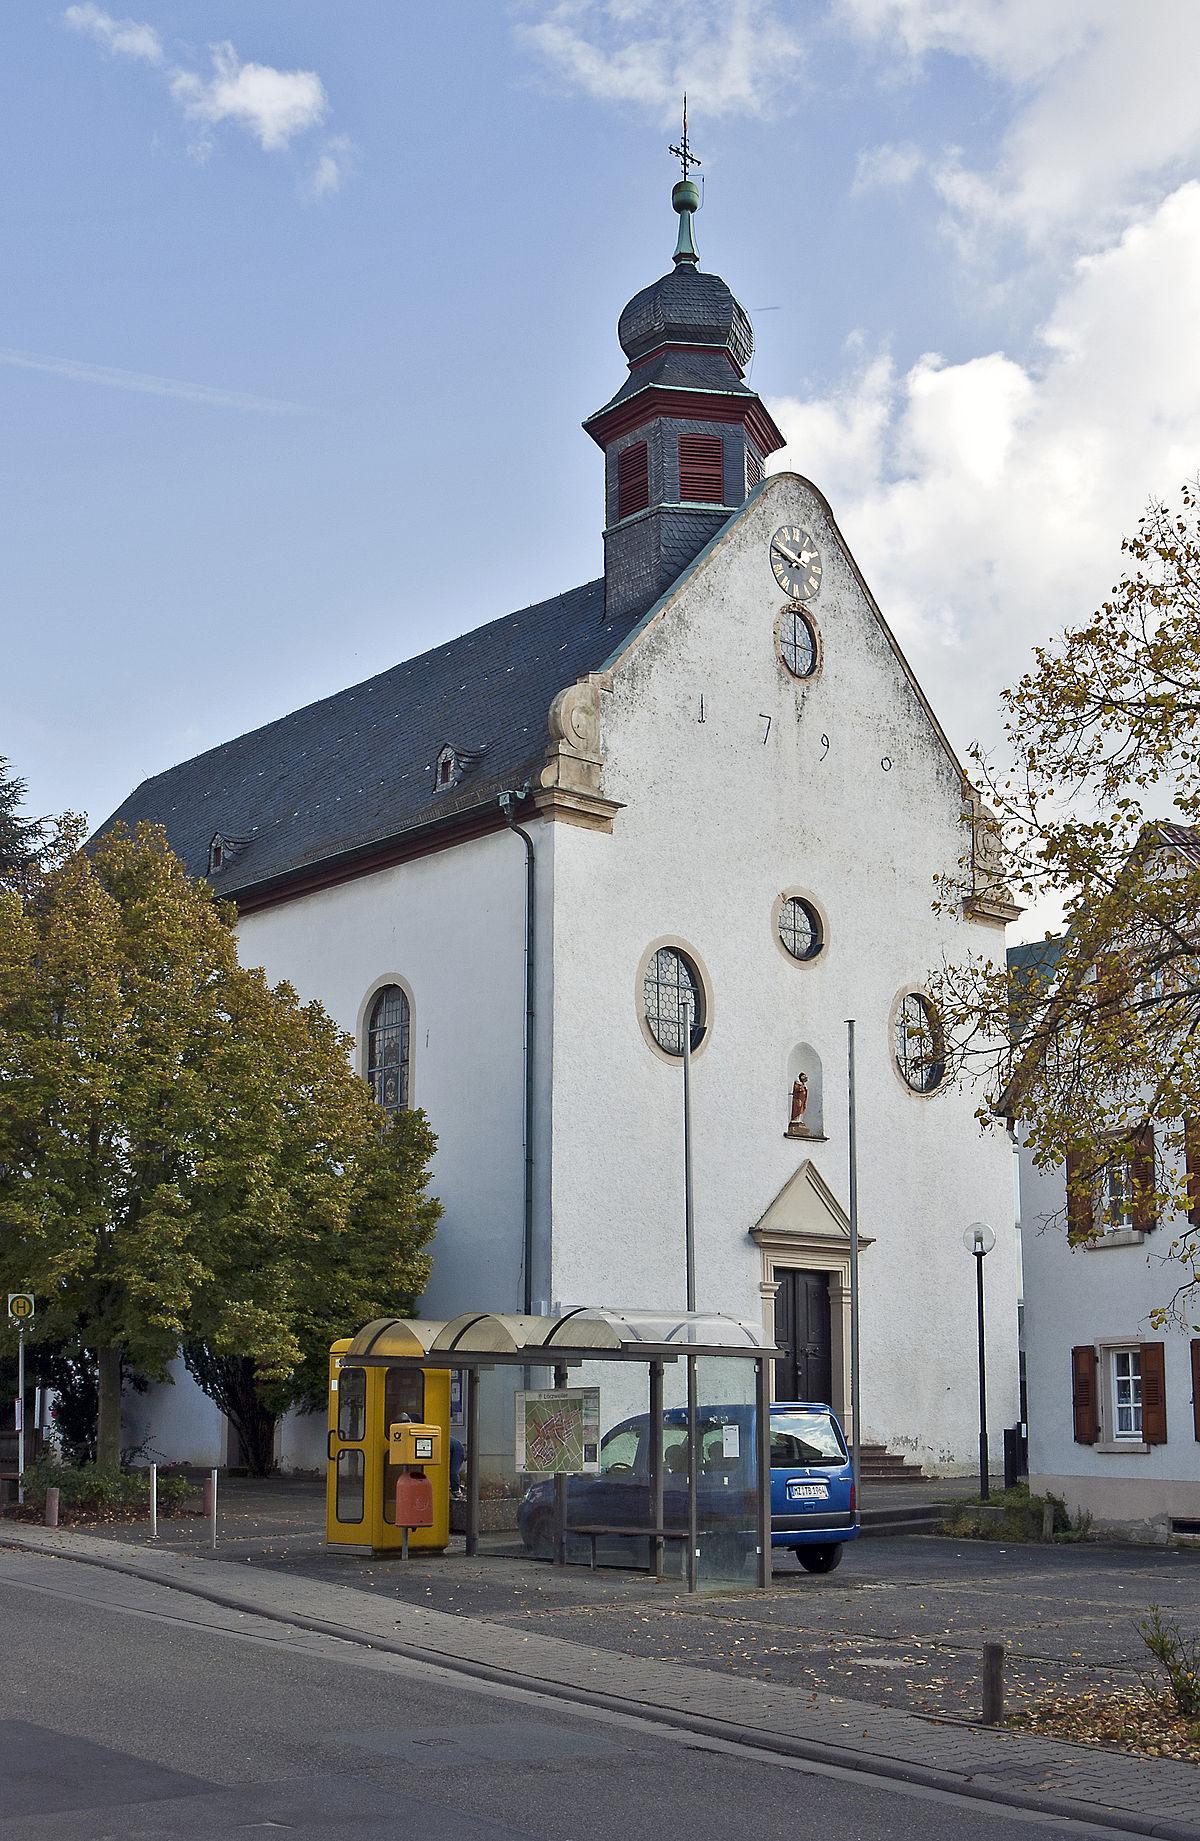 Lörzweiler